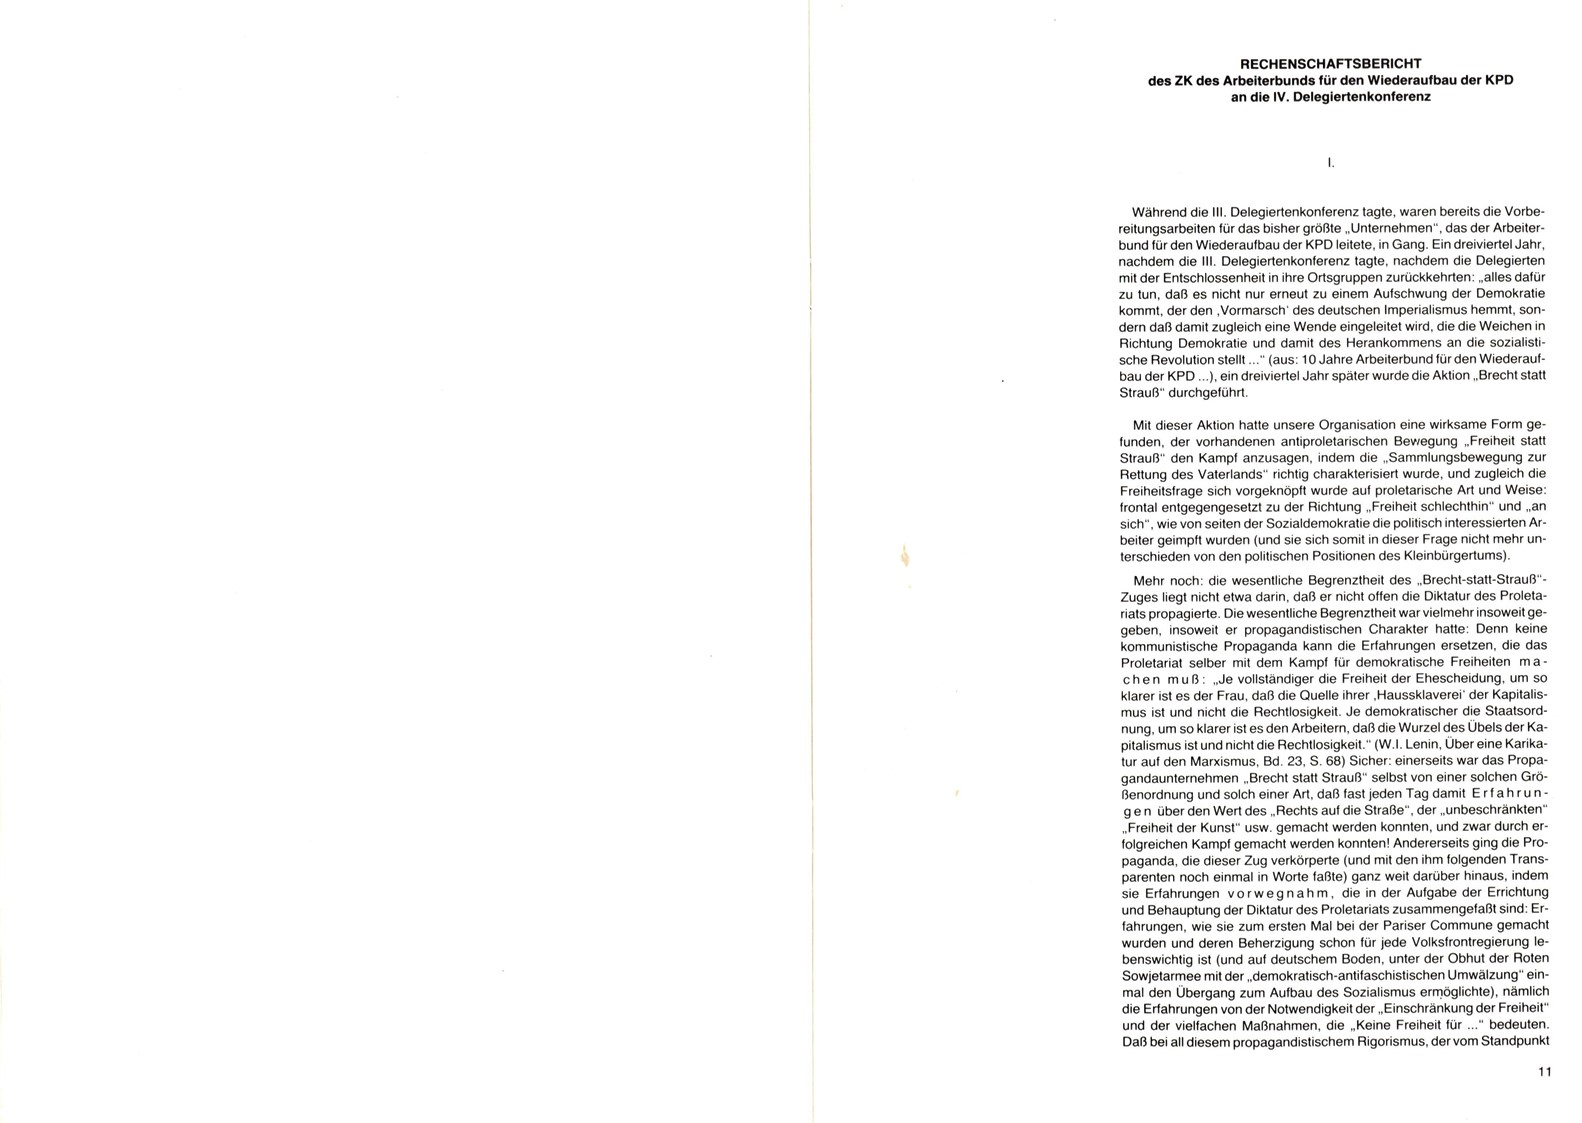 ABG_1985_Beschluesse_IV_Delegiertenkonferenz_07